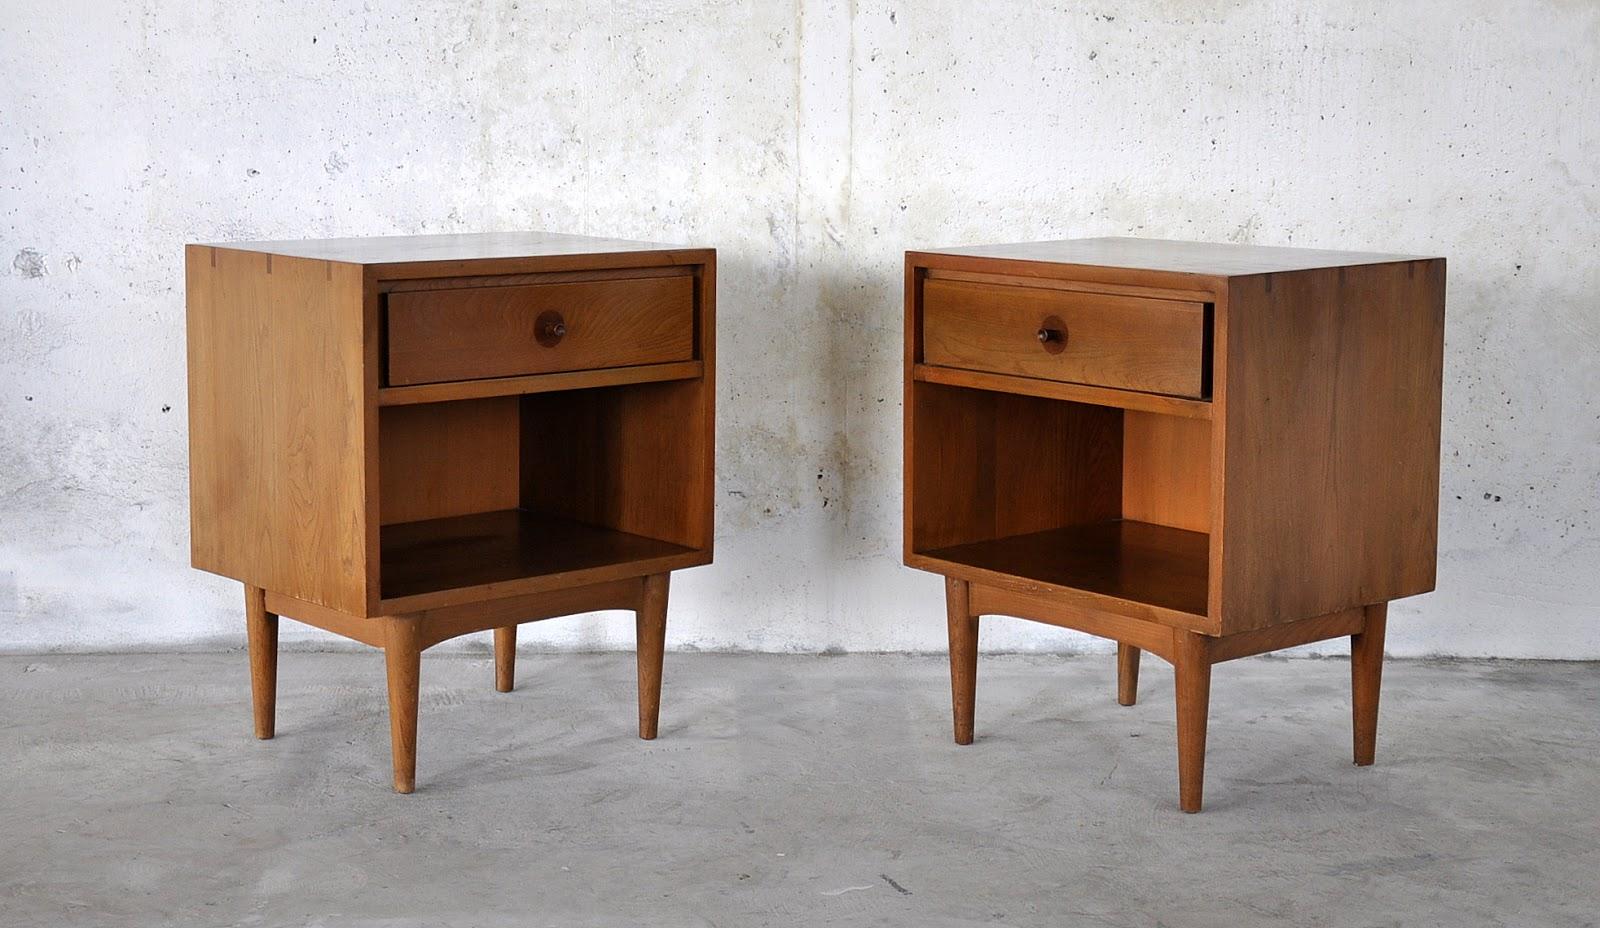 Mid century modern nightstands for sale elegant pair of for Modern nightstands for sale